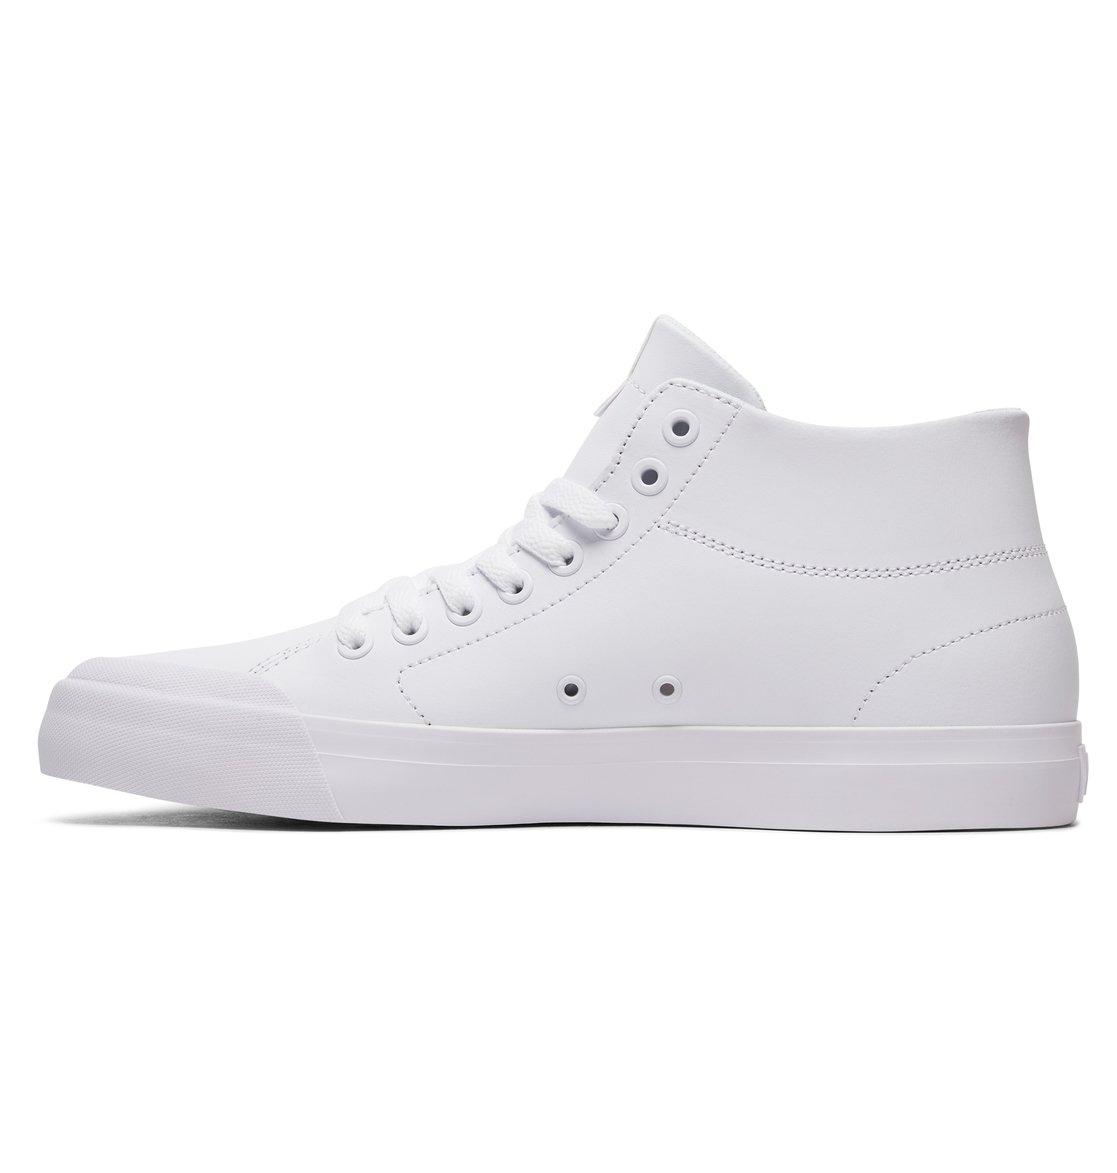 DC Hombres Evan Smith Hi Zero Zapatos blancos Talla 8 YXVKk5Ic3l